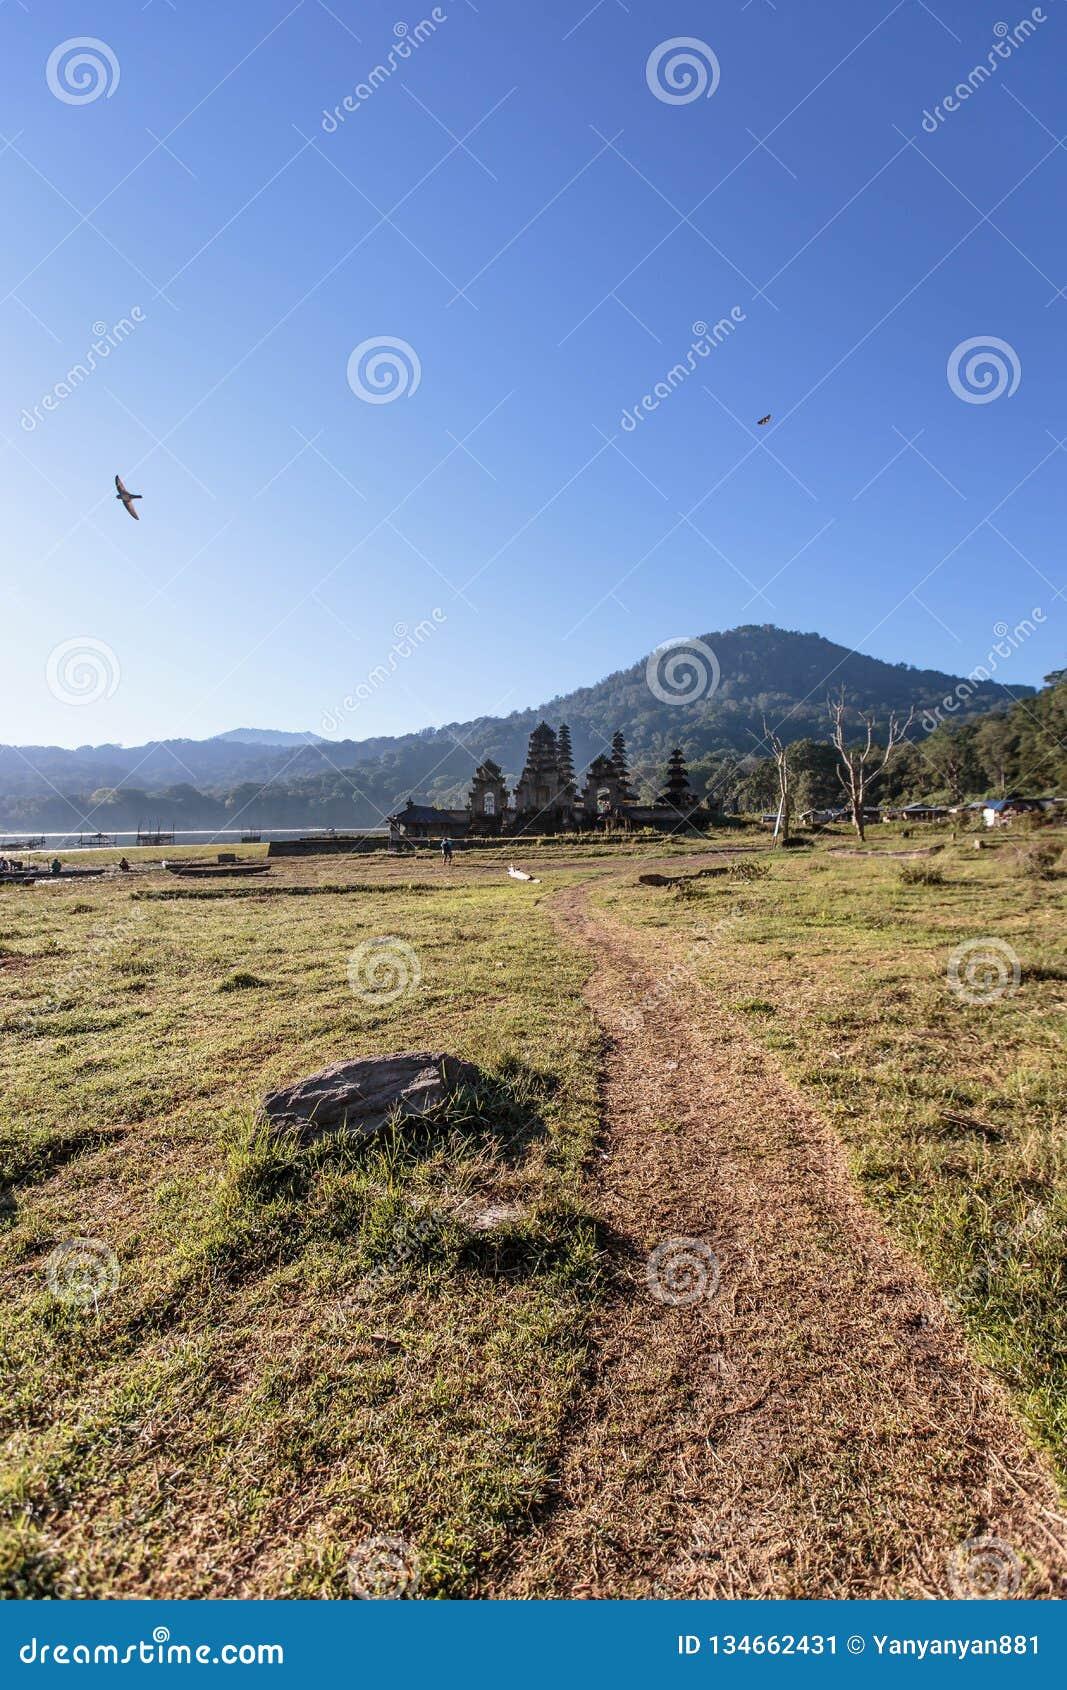 Peaceful background image of birds flying around natural landscape